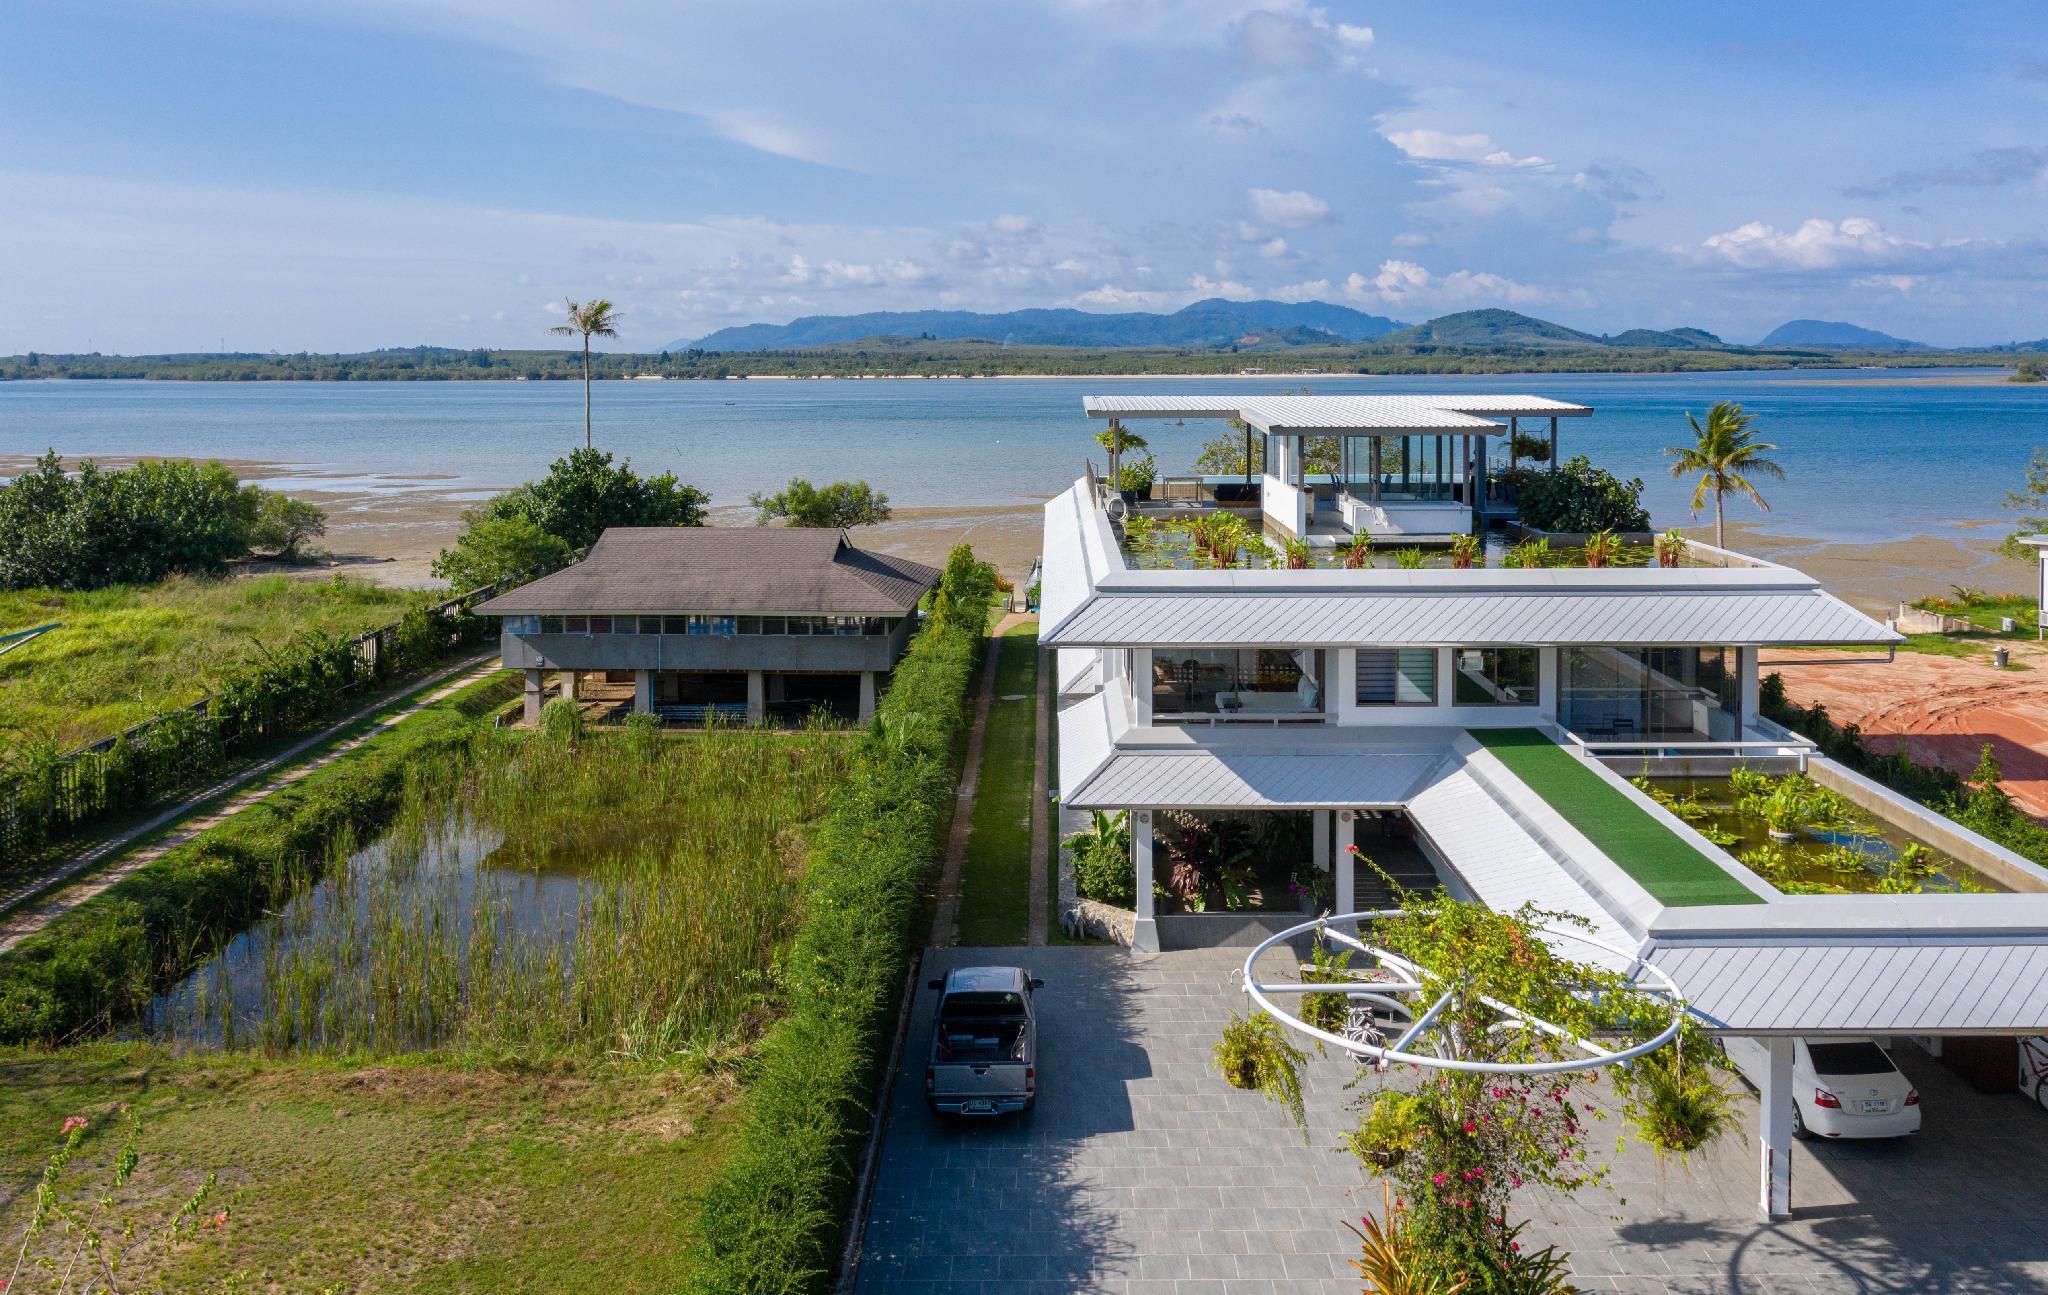 MaiKhao Beach Private Villa with Two Pools วิลลา 7 ห้องนอน 9 ห้องน้ำส่วนตัว ขนาด 2500 ตร.ม. – ไม้ขาว